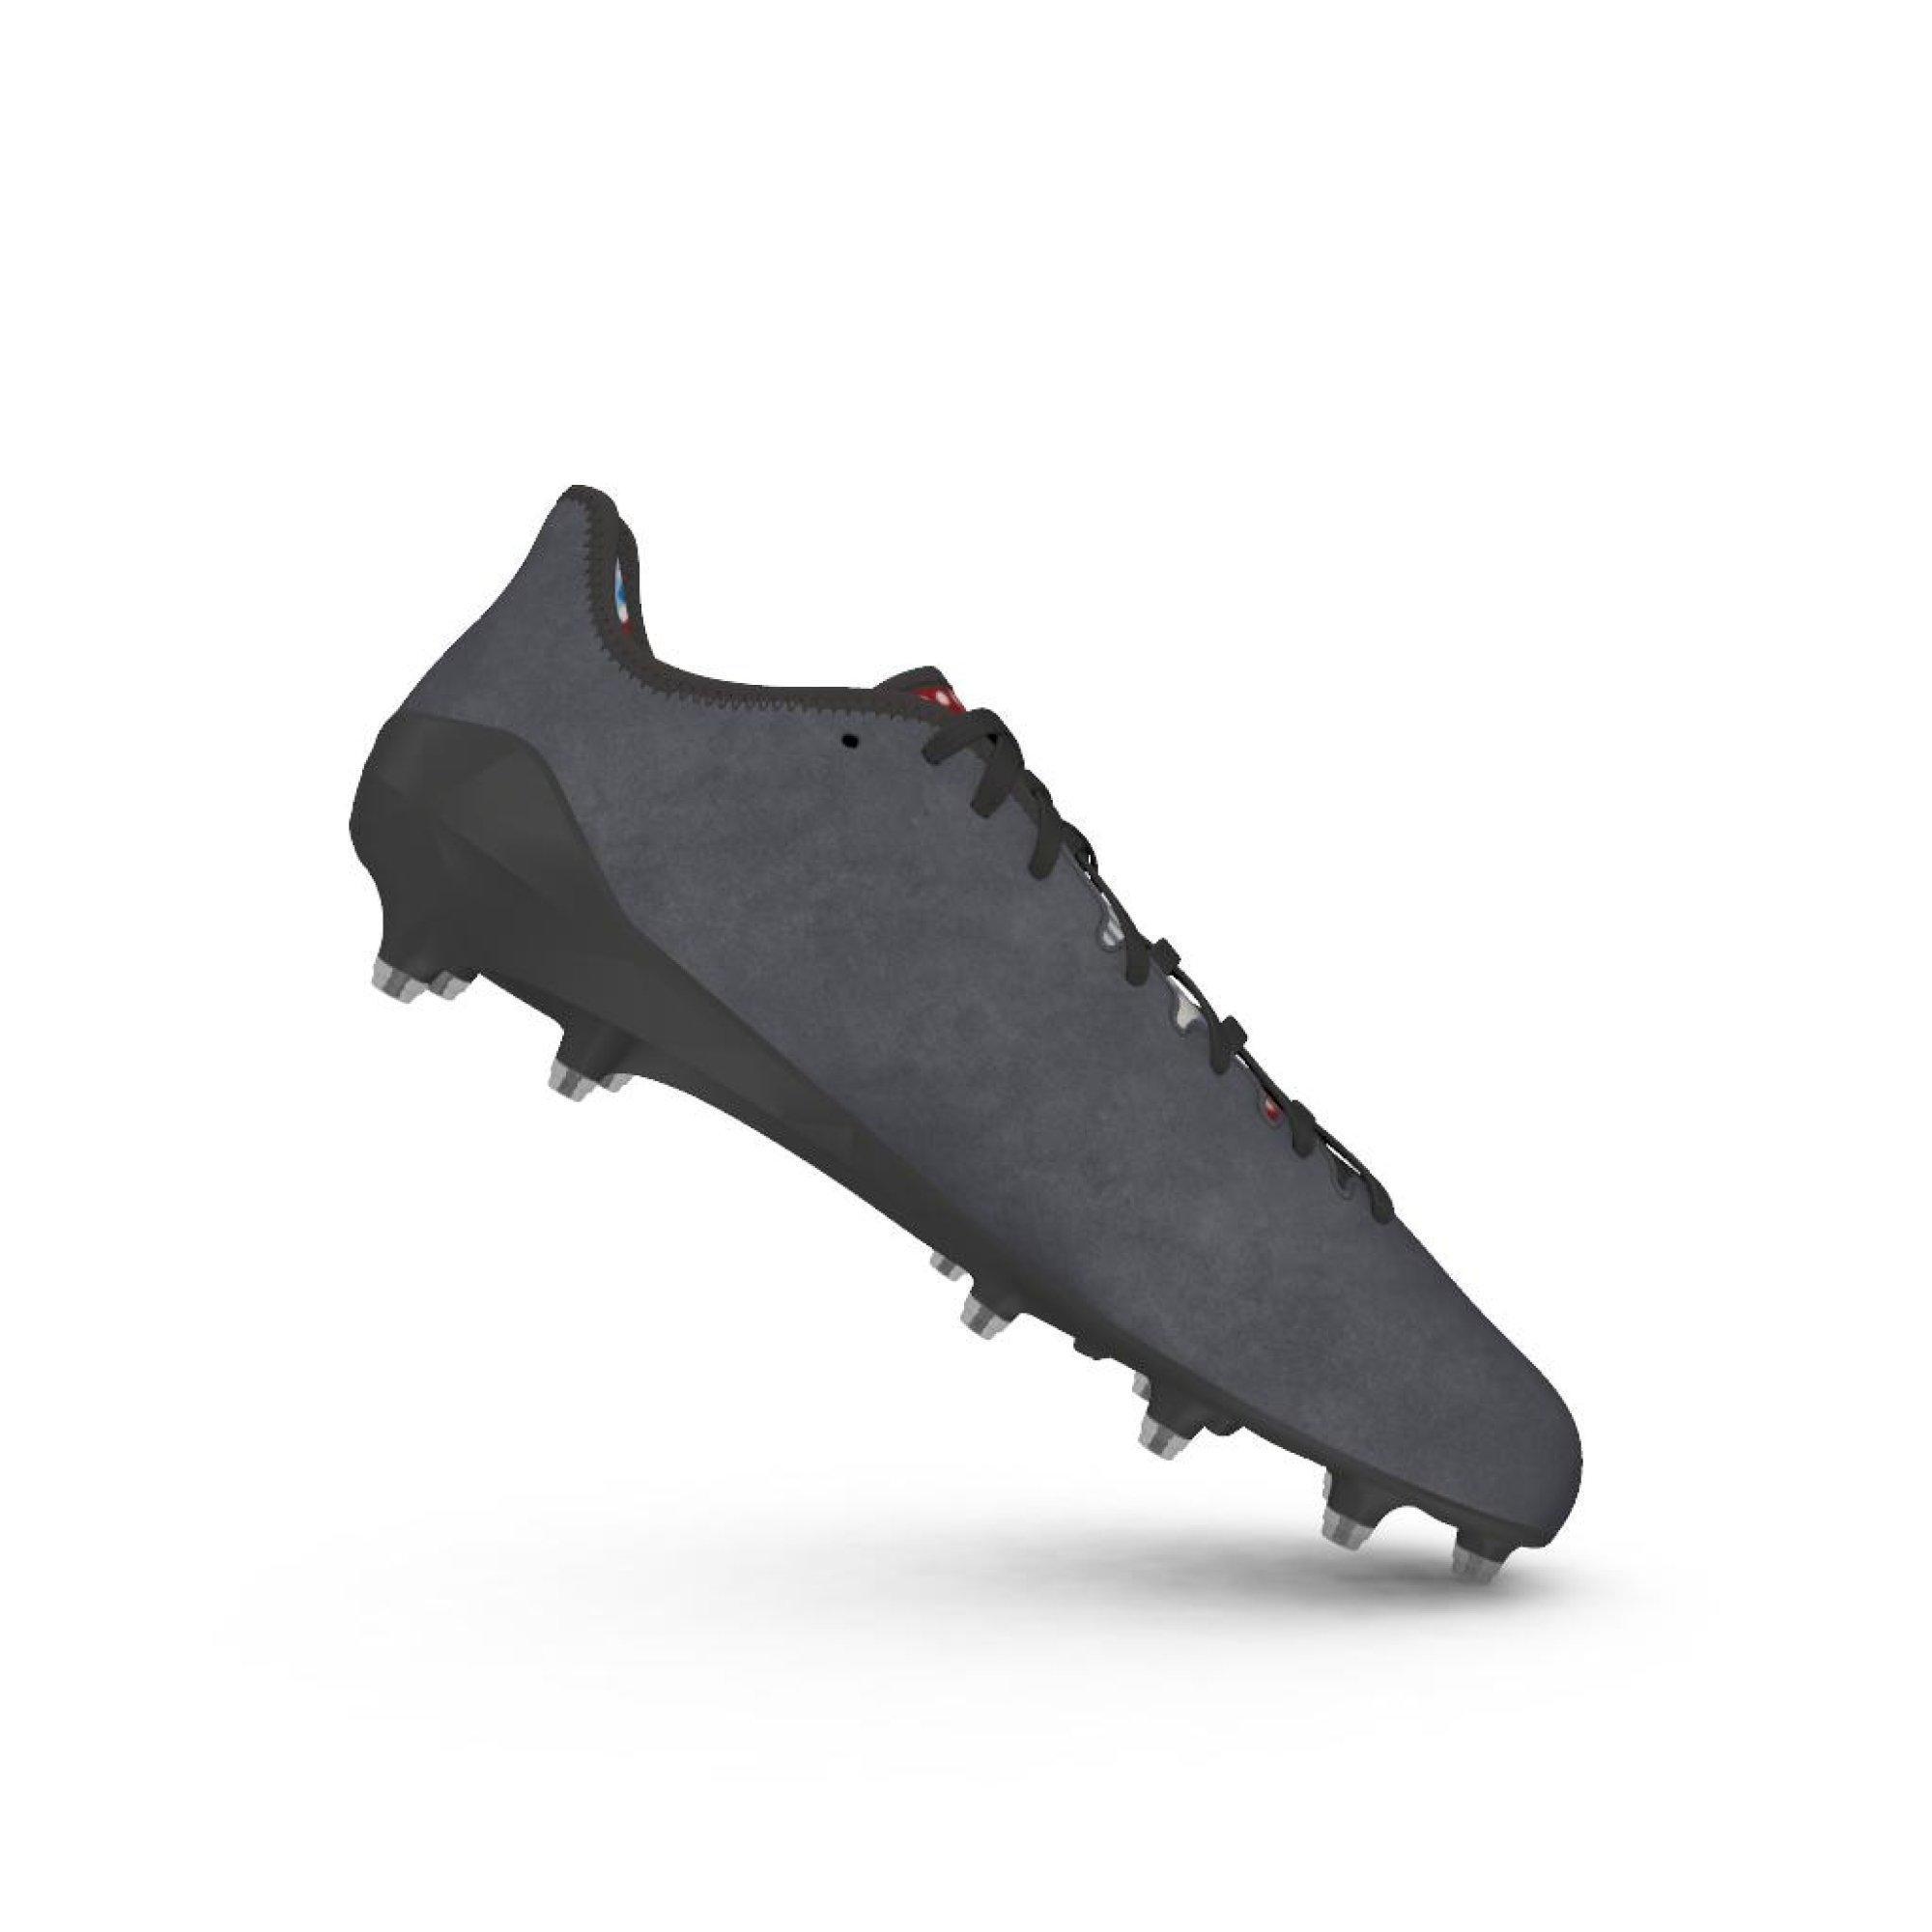 adidas 5 0 football cleats. adidas men\u0027s adizero 5-star 6.0 sundays best football cleat - main container image 5 0 cleats